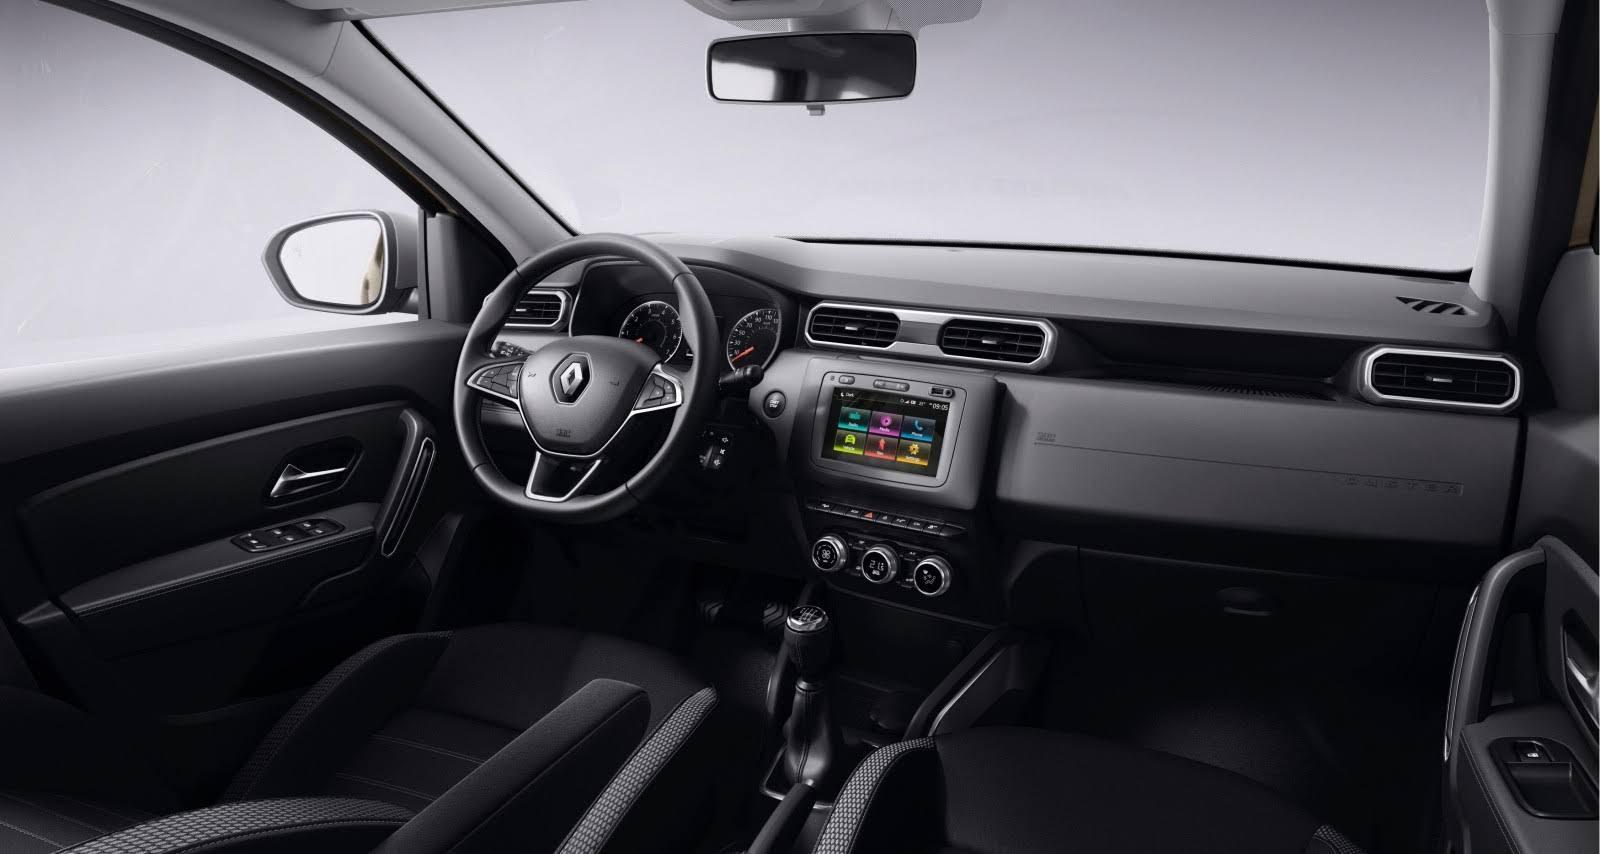 Интерьер кроссовера Renault Duster